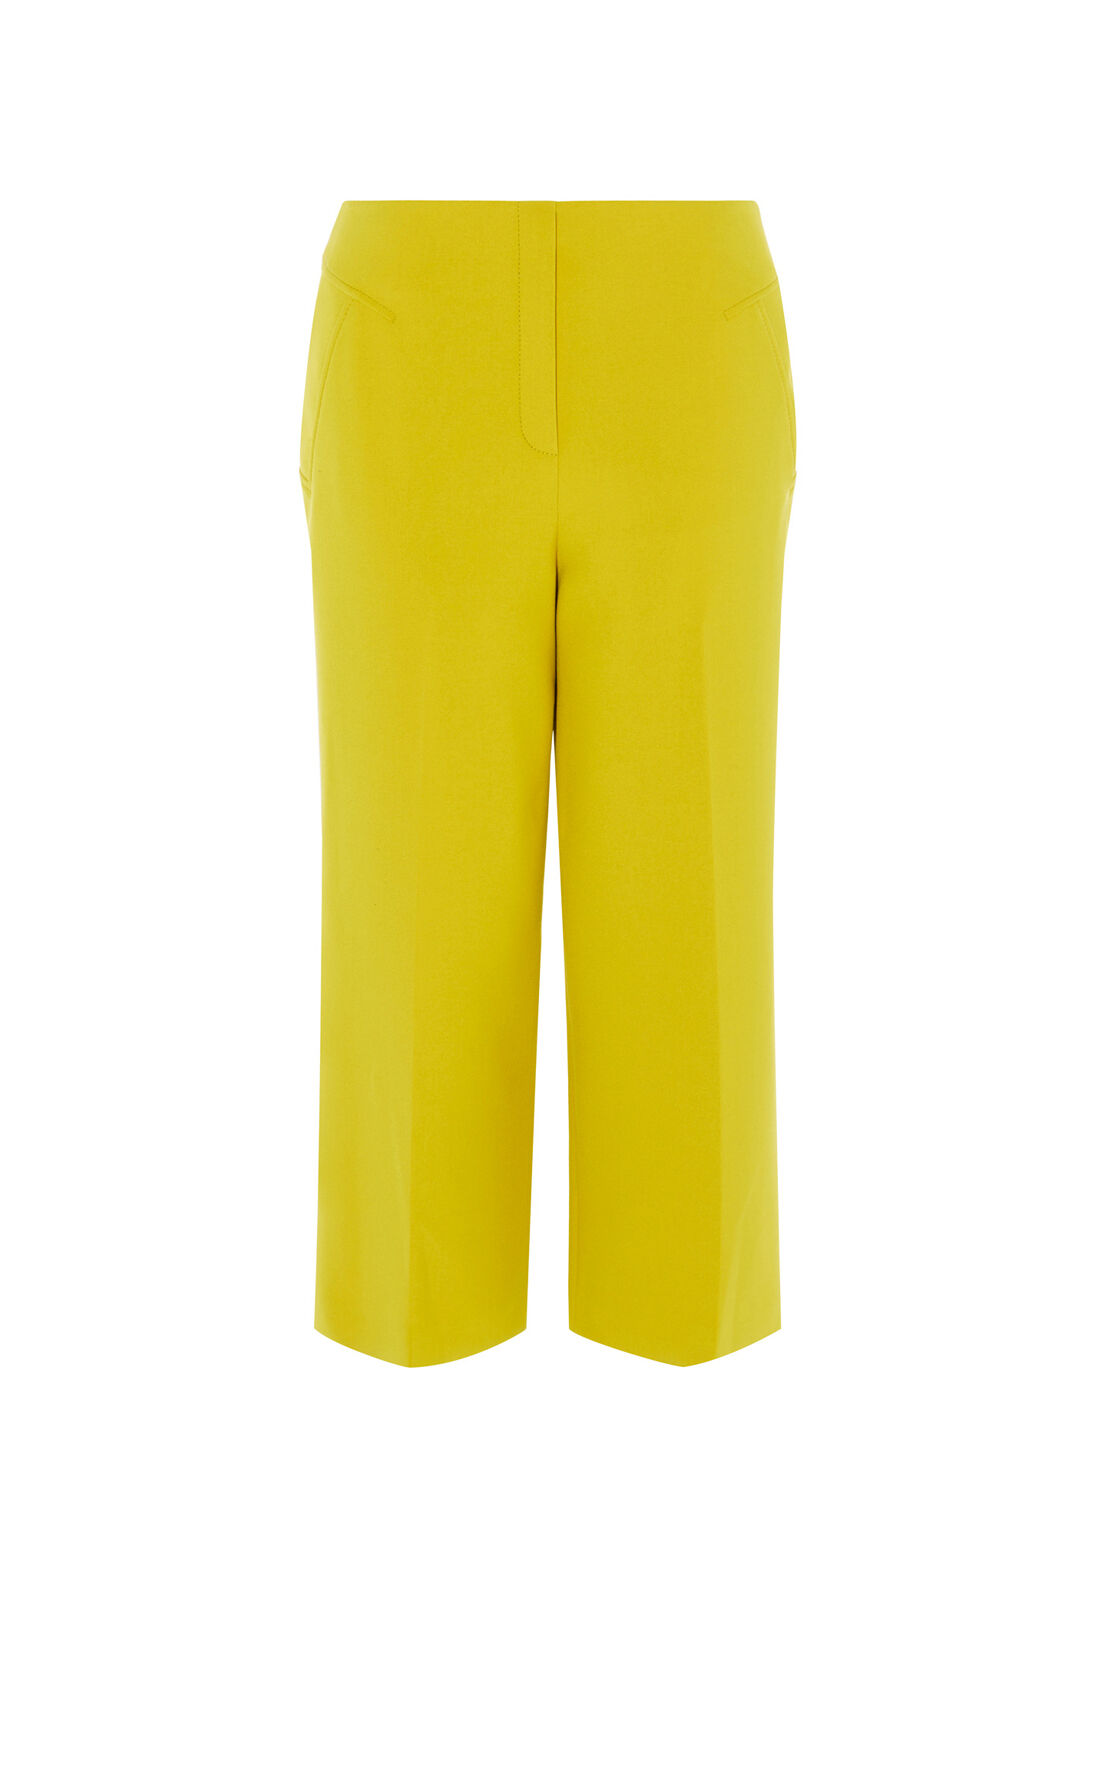 Karen Millen, CROPPED WIDE-LEG TROUSERS Yellow 0